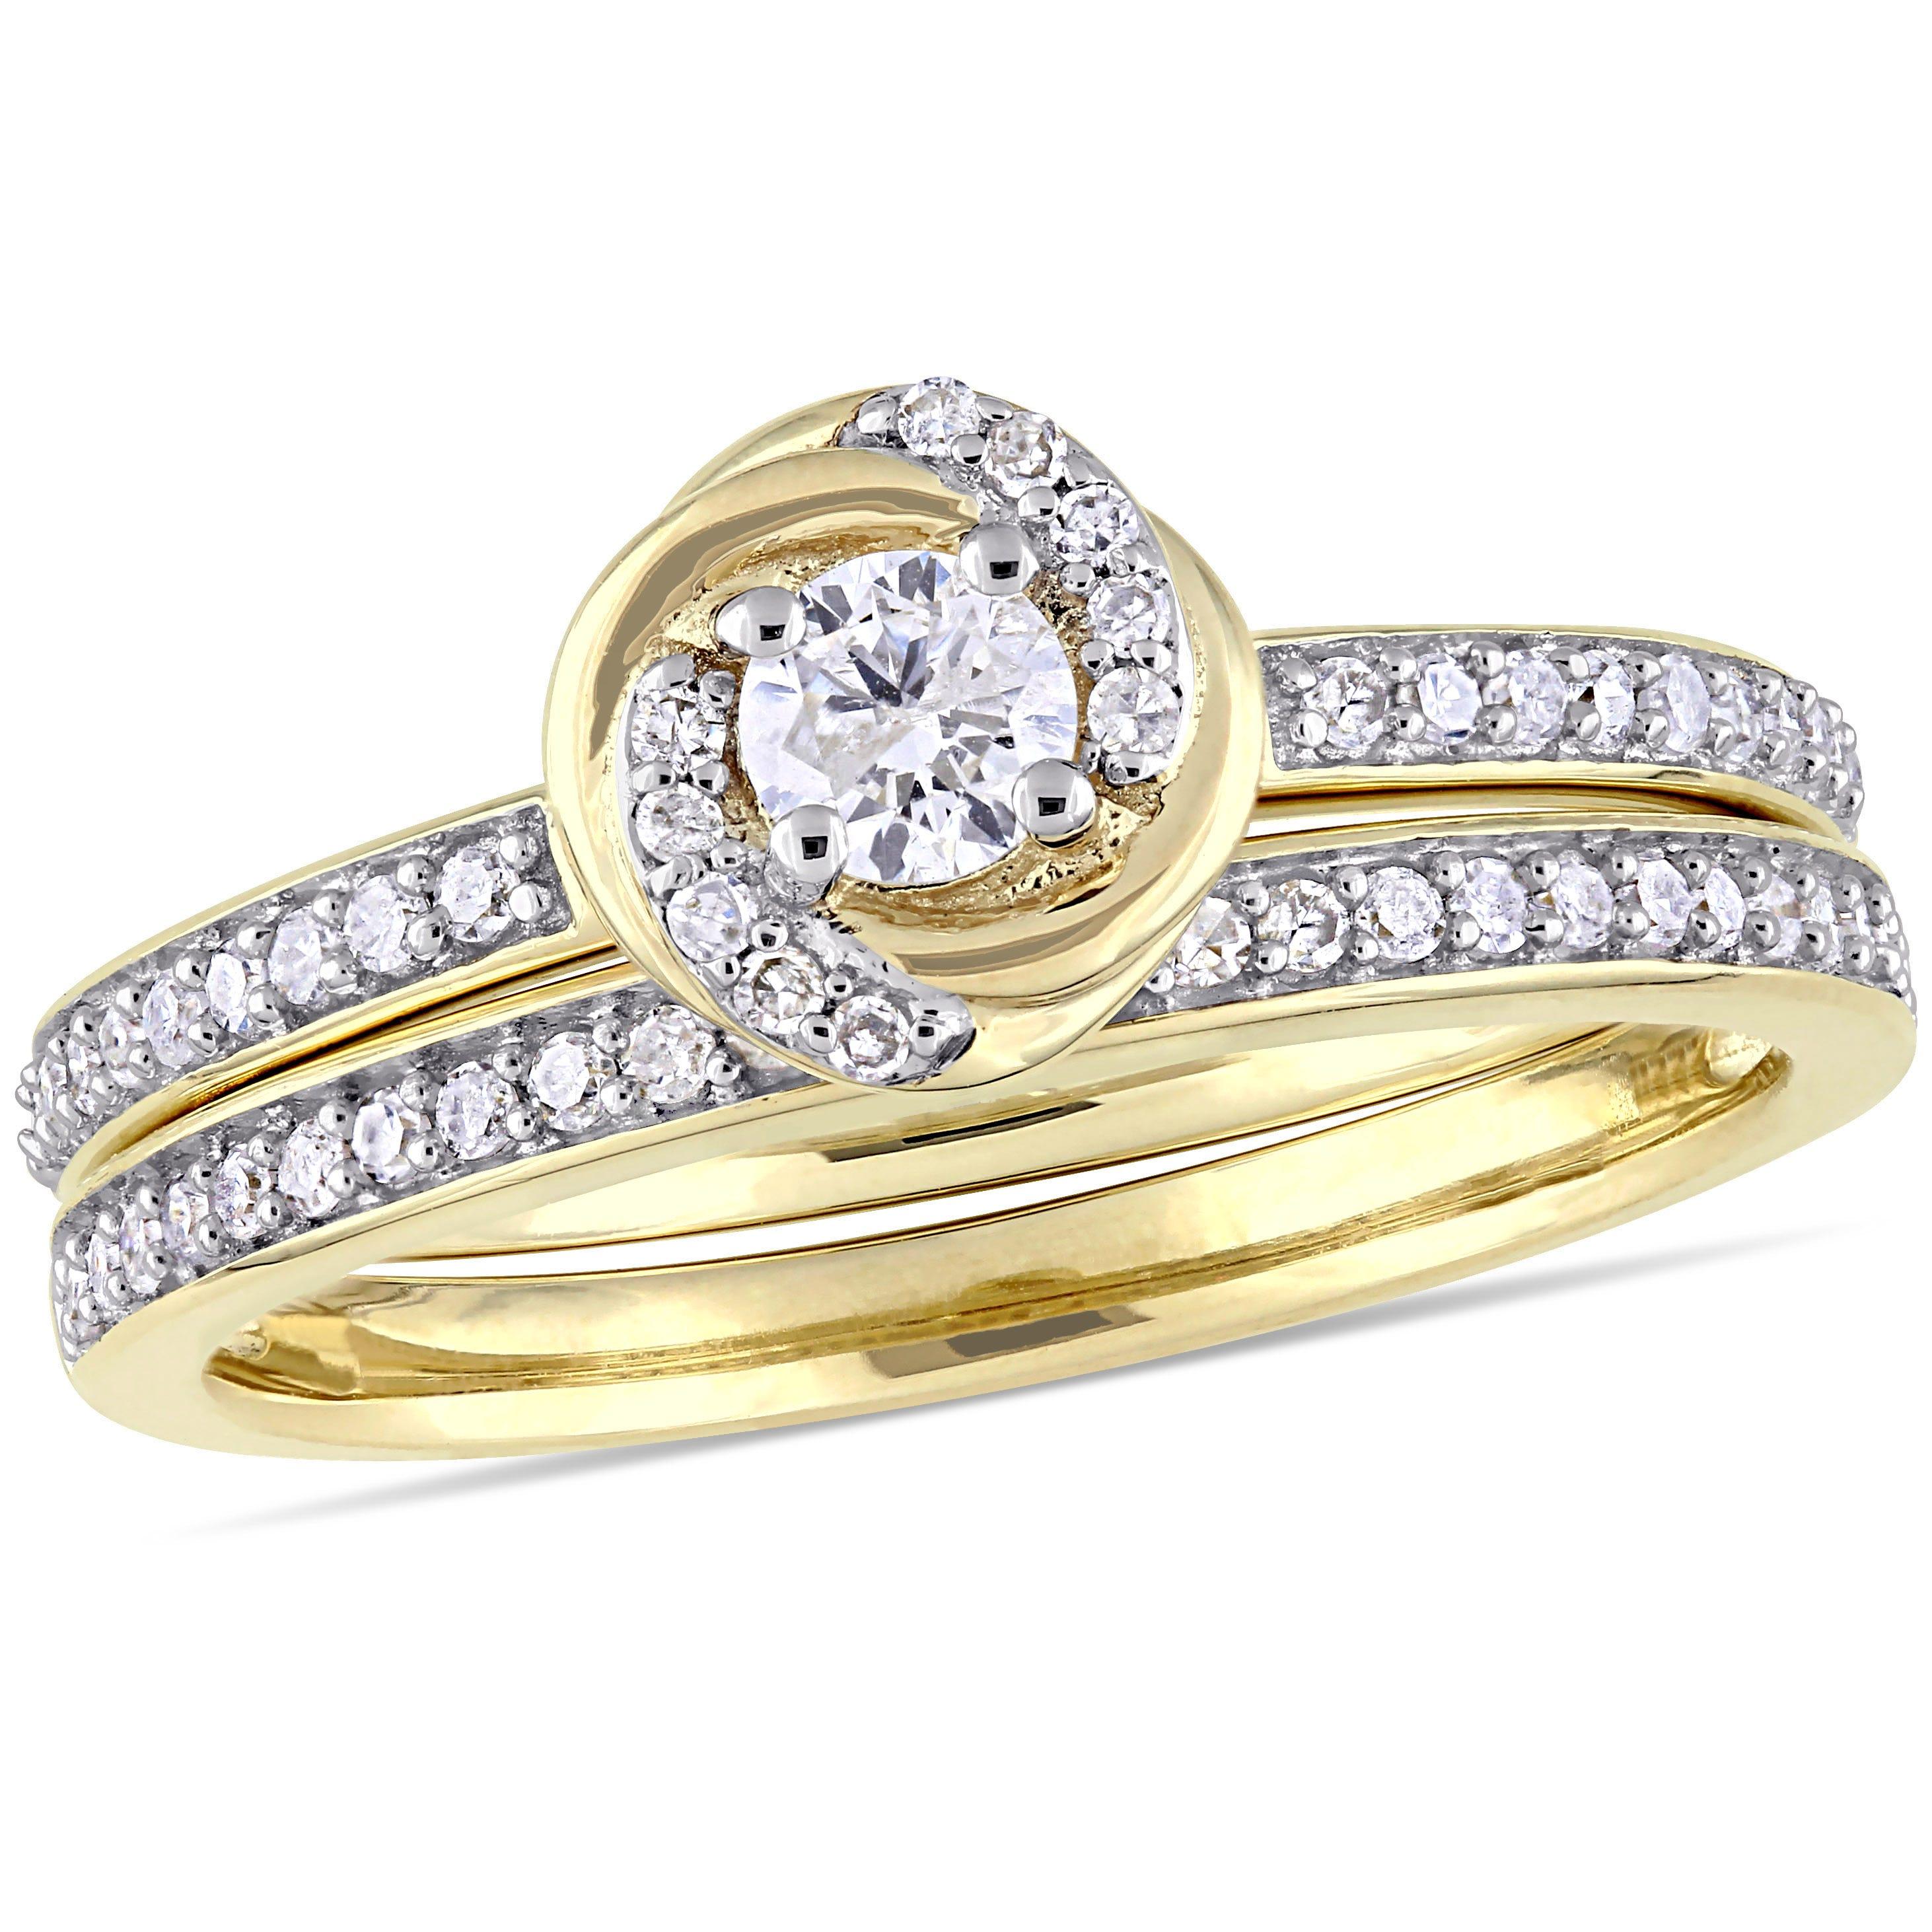 Diamond Swirl Bridal Set 1/2ctw. in 10k Yellow Gold